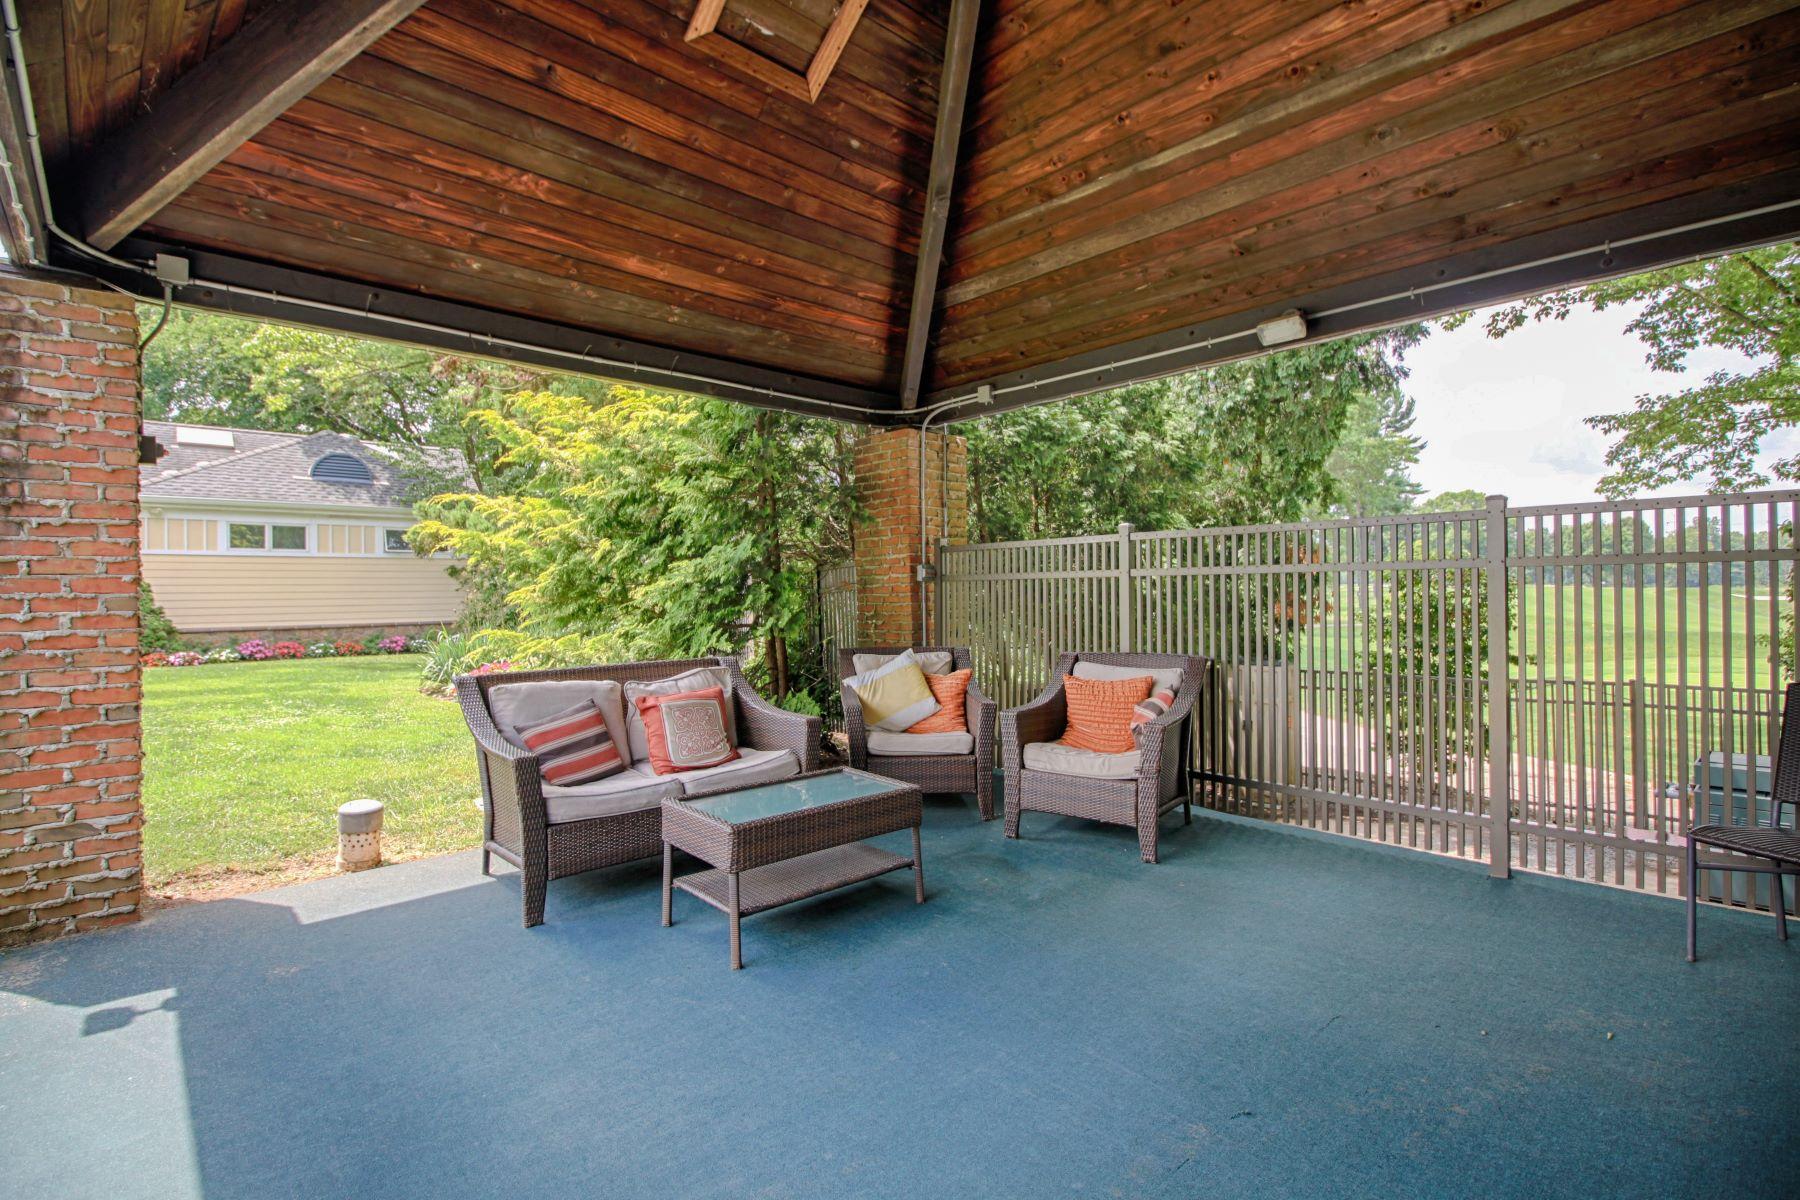 Additional photo for property listing at Ease into Luxury at Cobblestone Creek 7 Dogleg Lane, Lawrenceville, Nova Jersey 08648 Estados Unidos